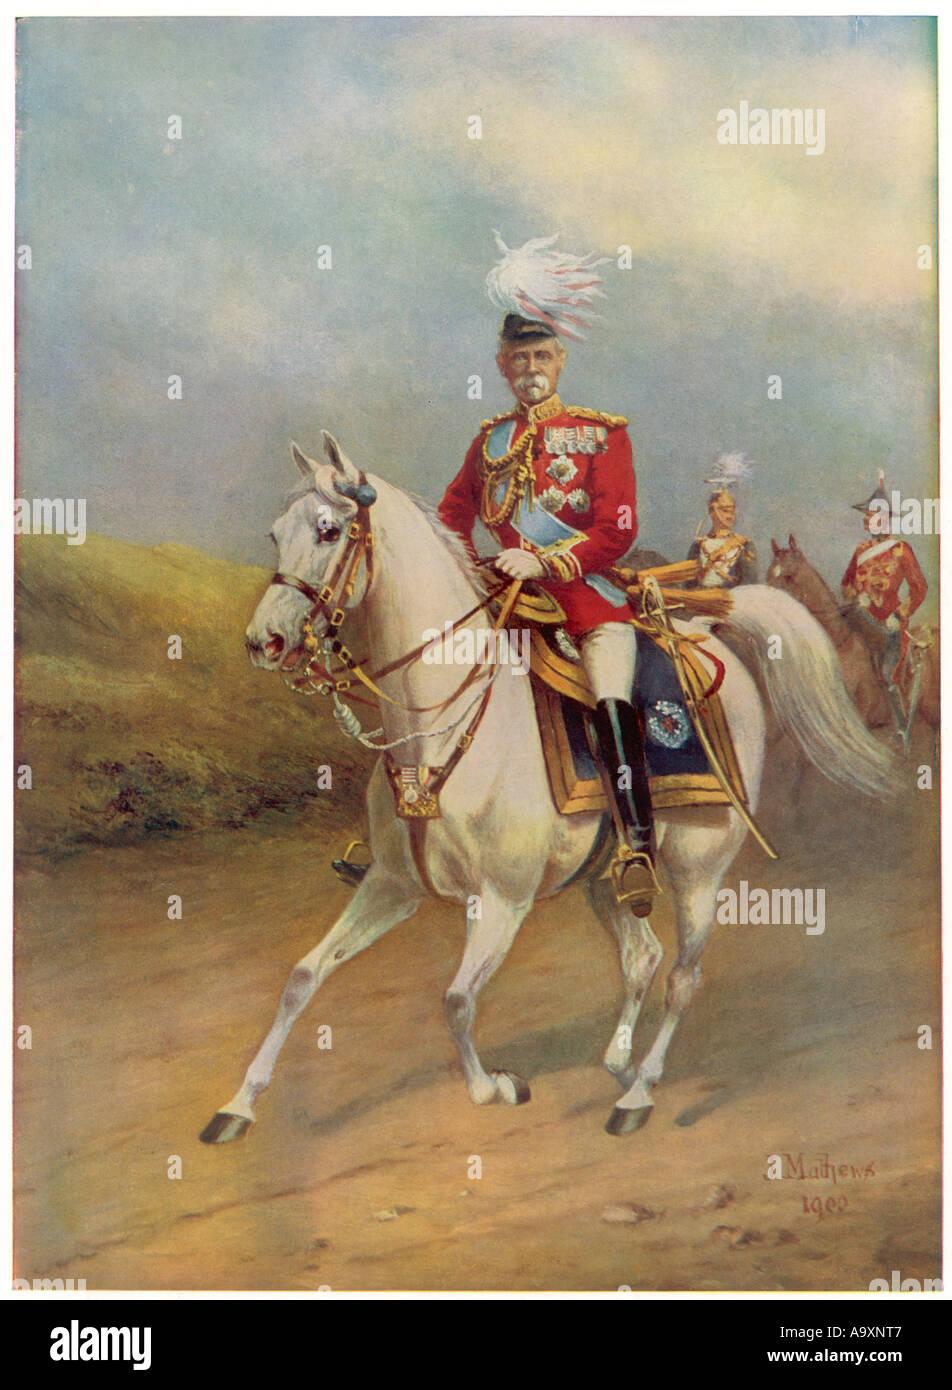 Lord Roberts 1900 - Stock Image